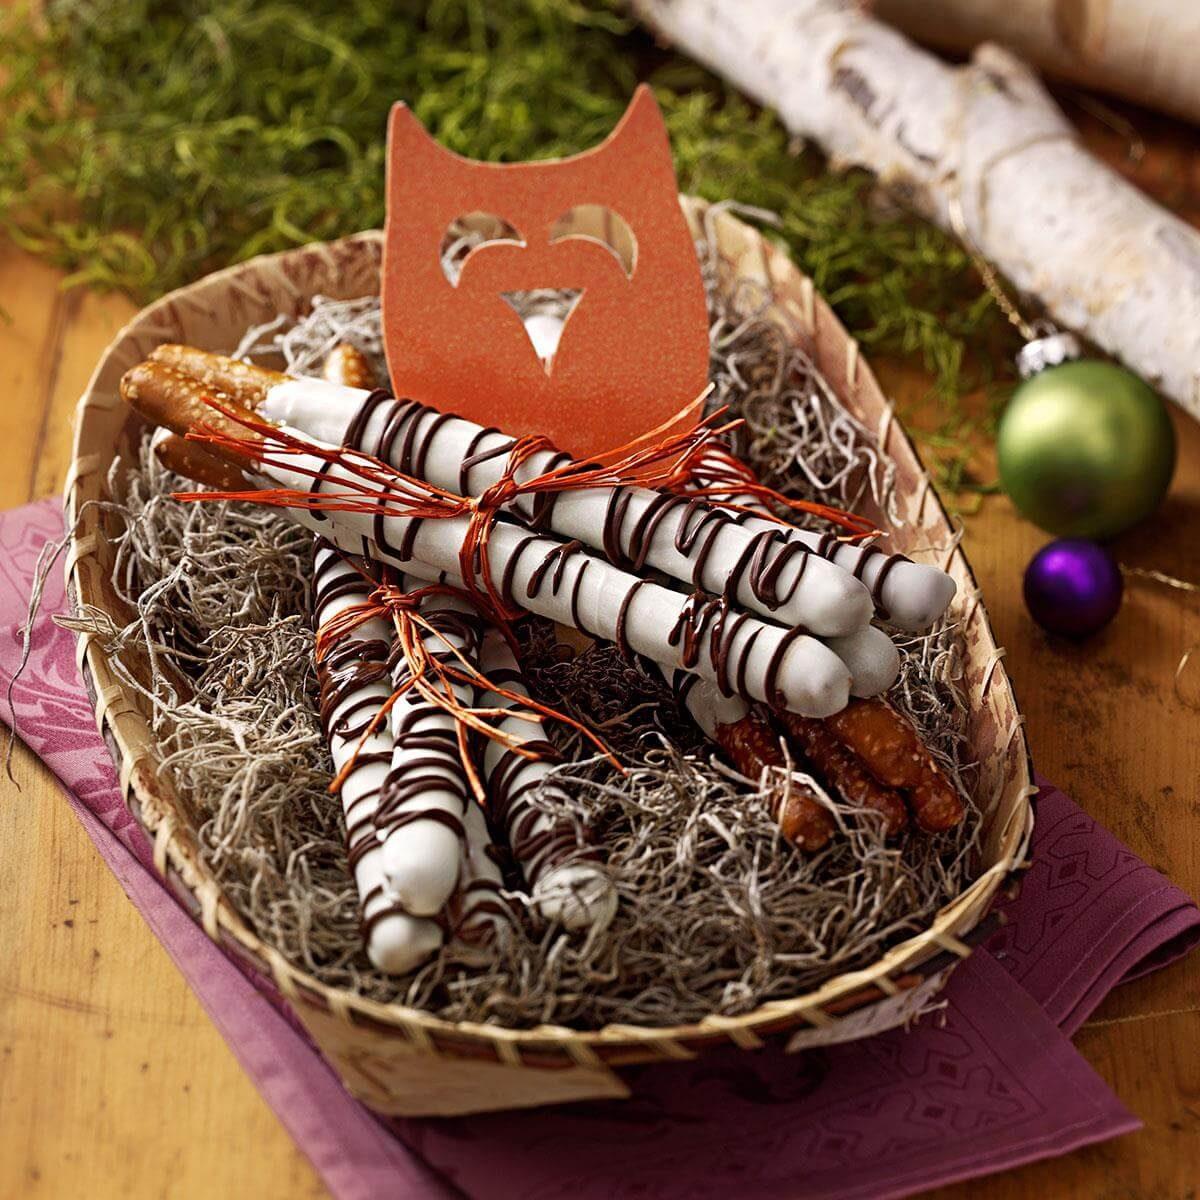 Chocolate Pretzel Logs Dunmore Candy Kitchen: Birch Pretzel Logs Recipe